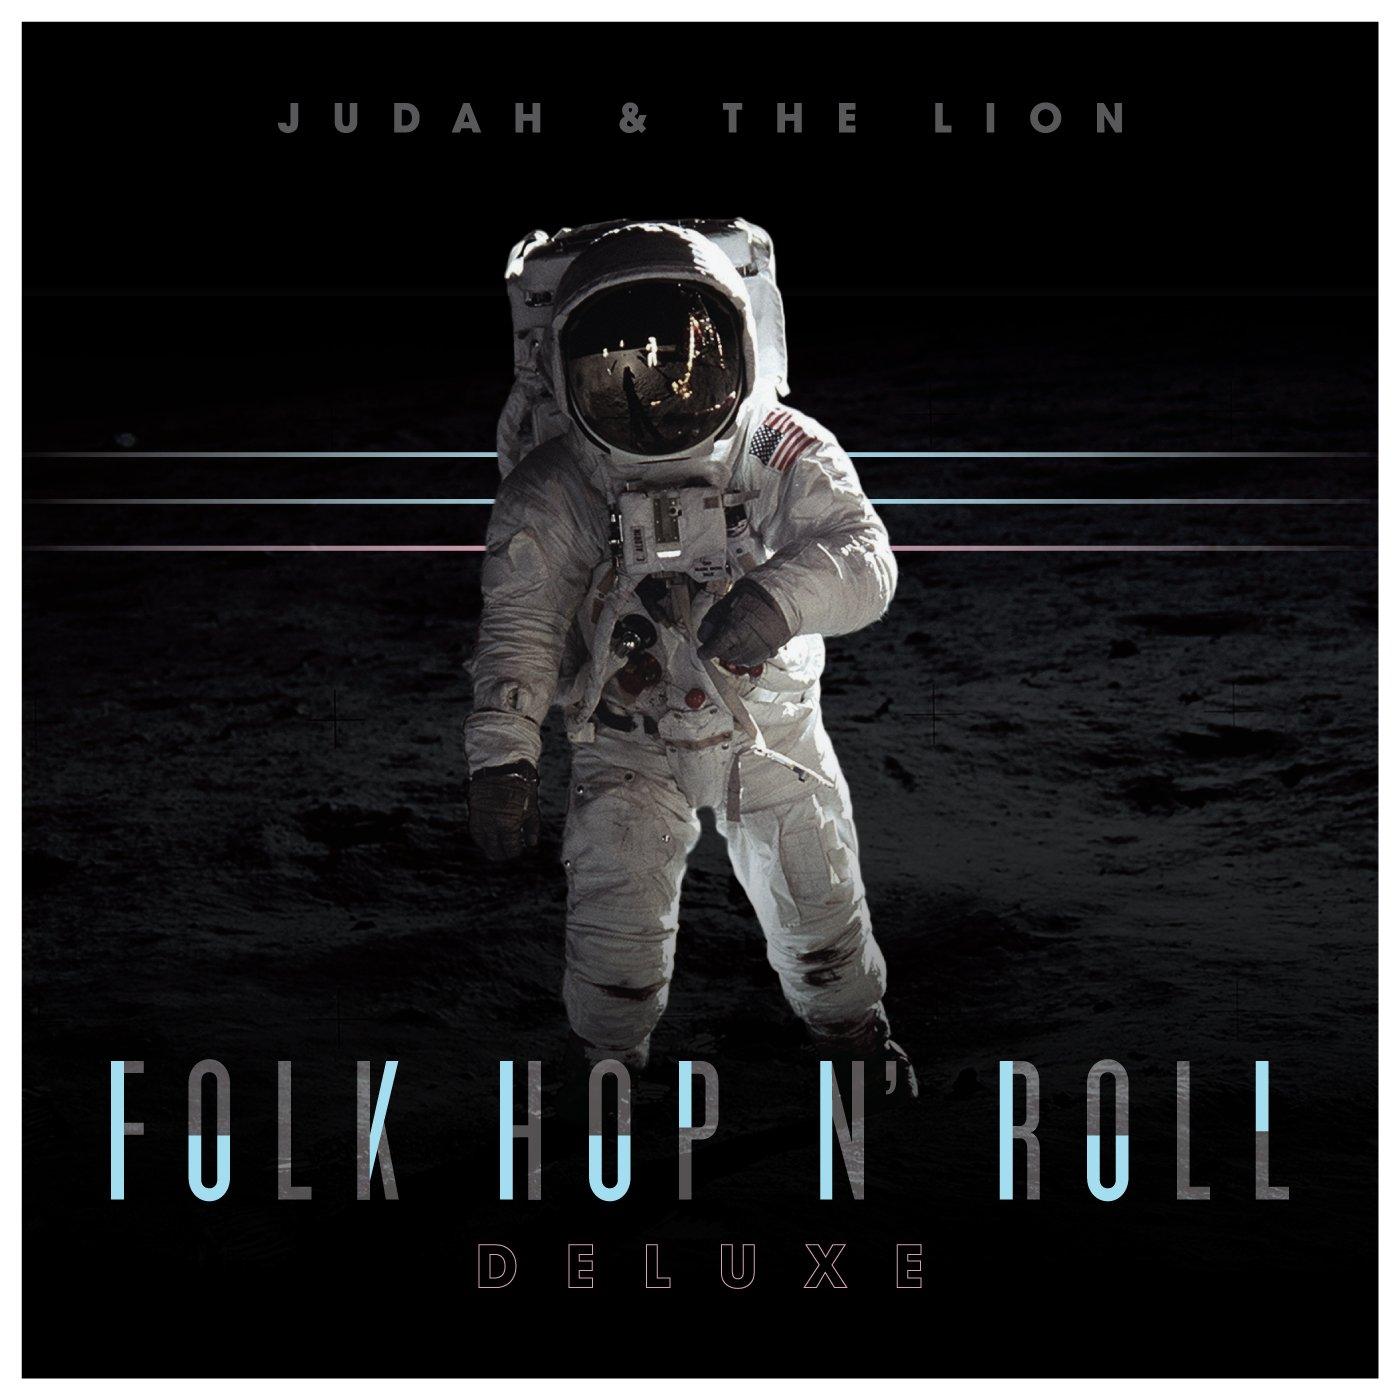 Folk Hop N Roll by Judah & the Lion